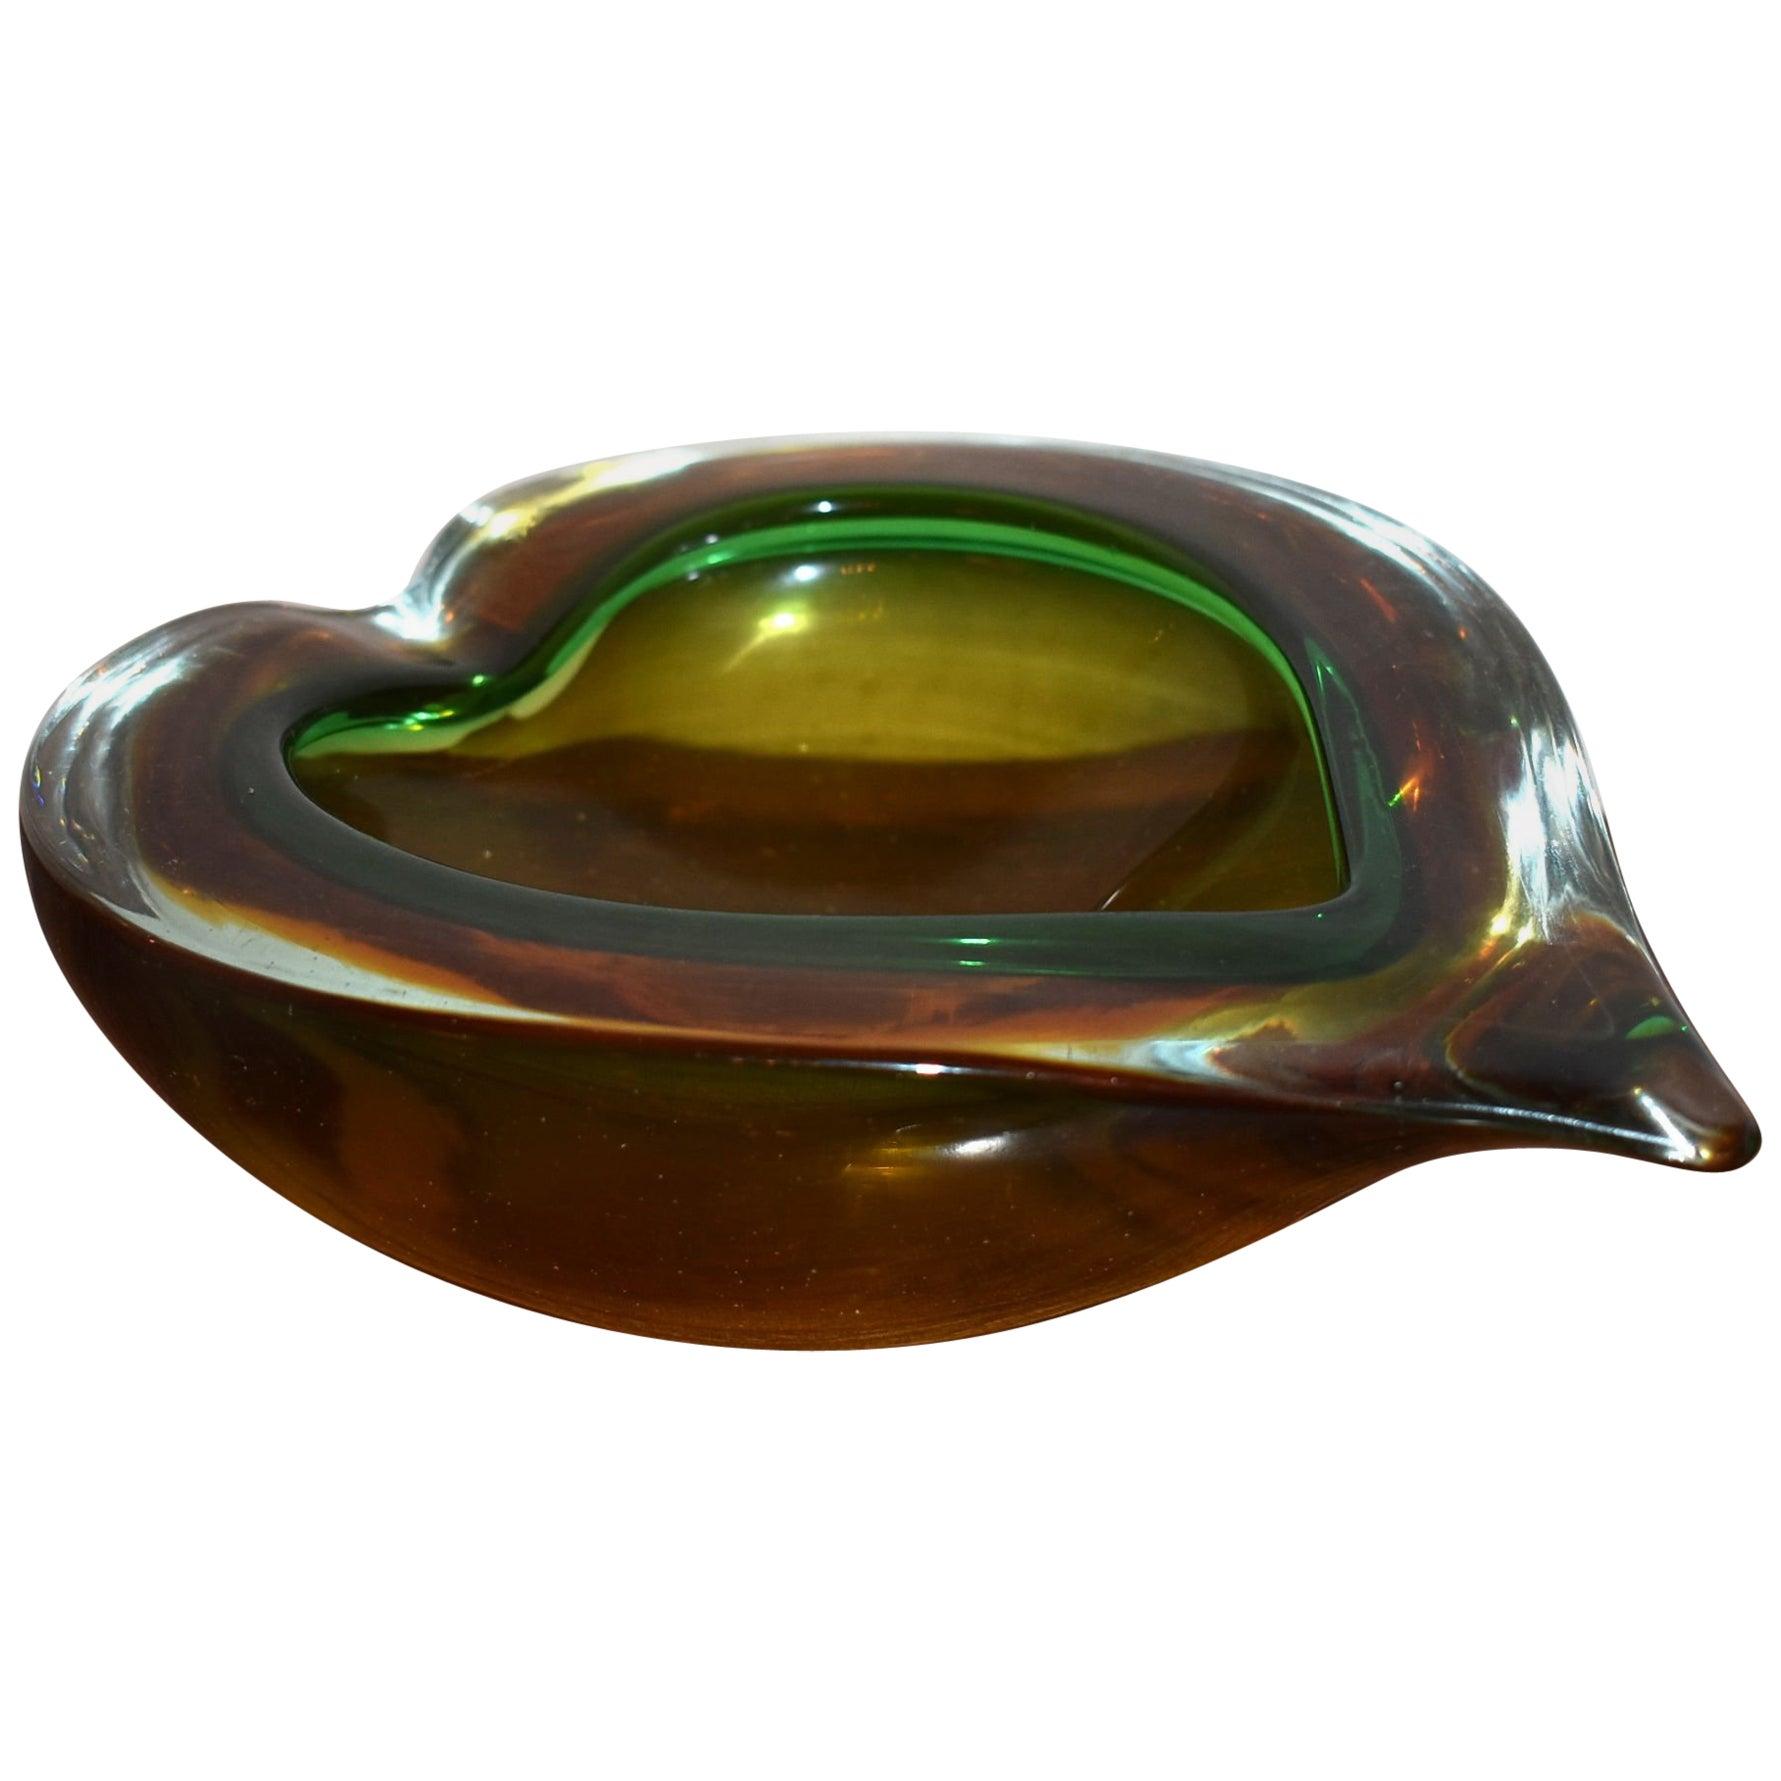 1960s Large Heart Shaped Murano Glass Ashtray Bowl